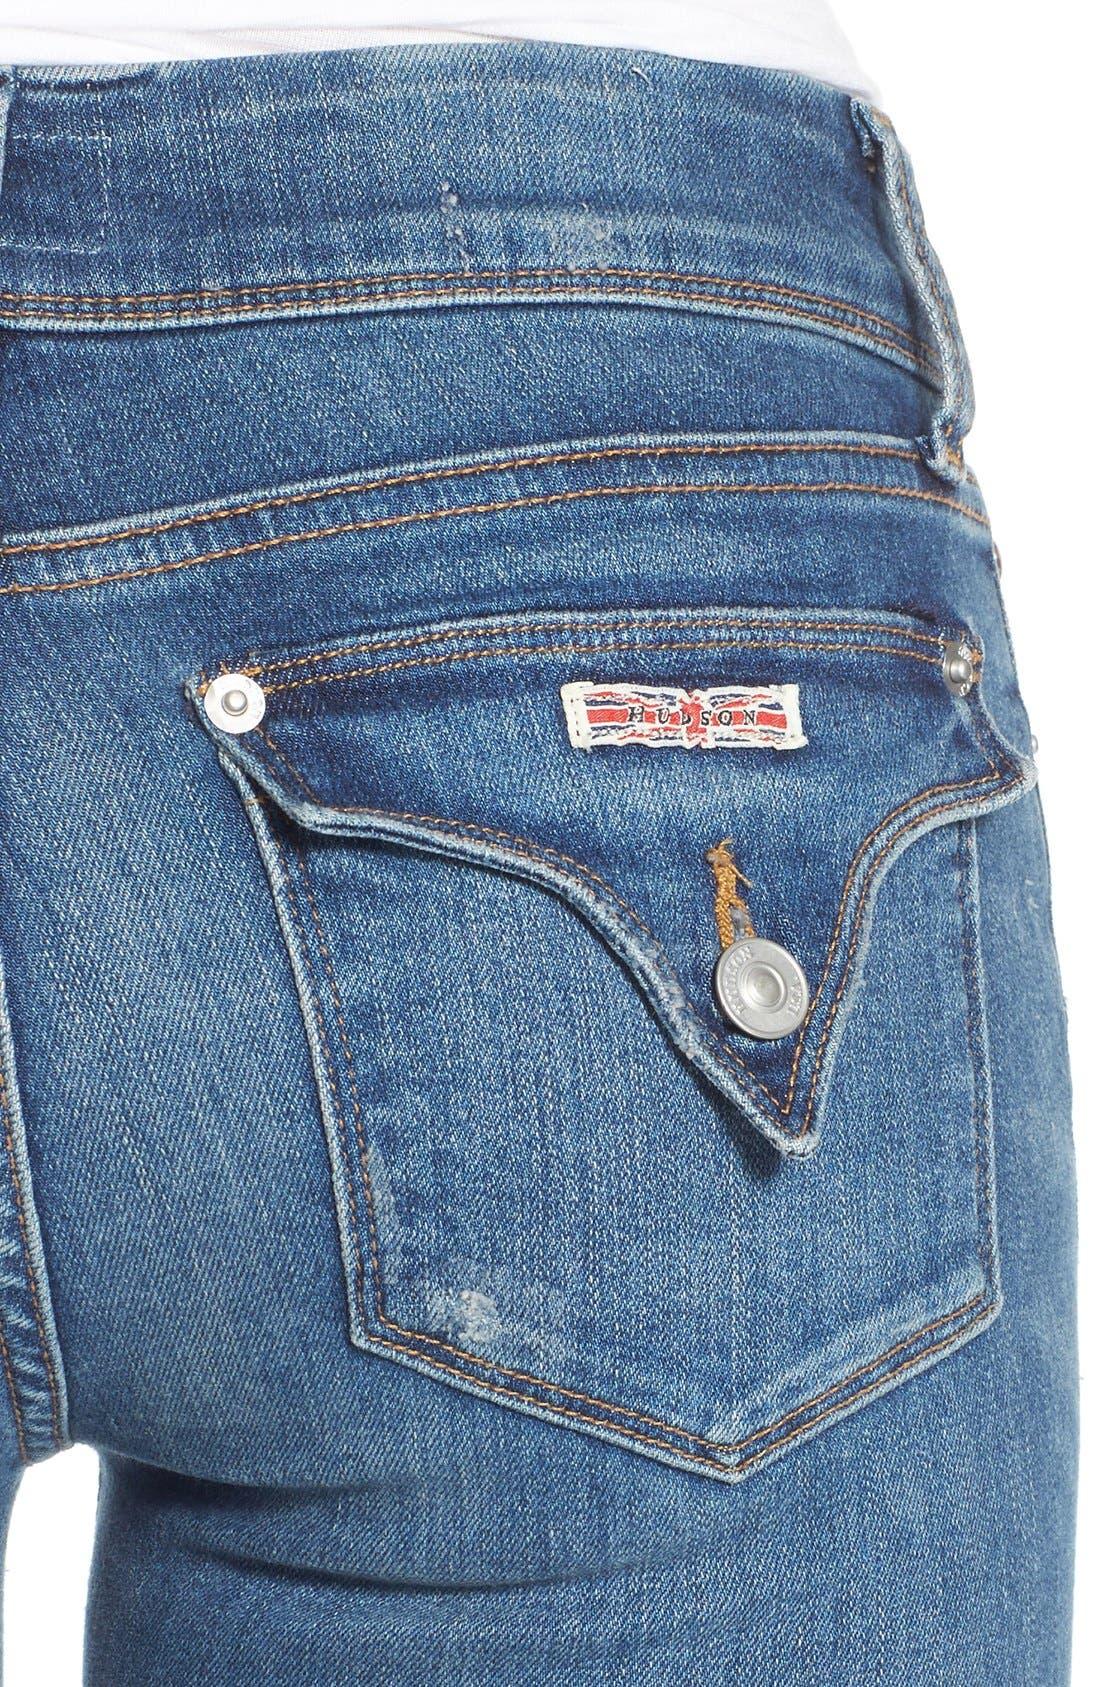 Alternate Image 4  - Hudson Jeans 'Ginny' Rolled Crop Jeans (Point Break)